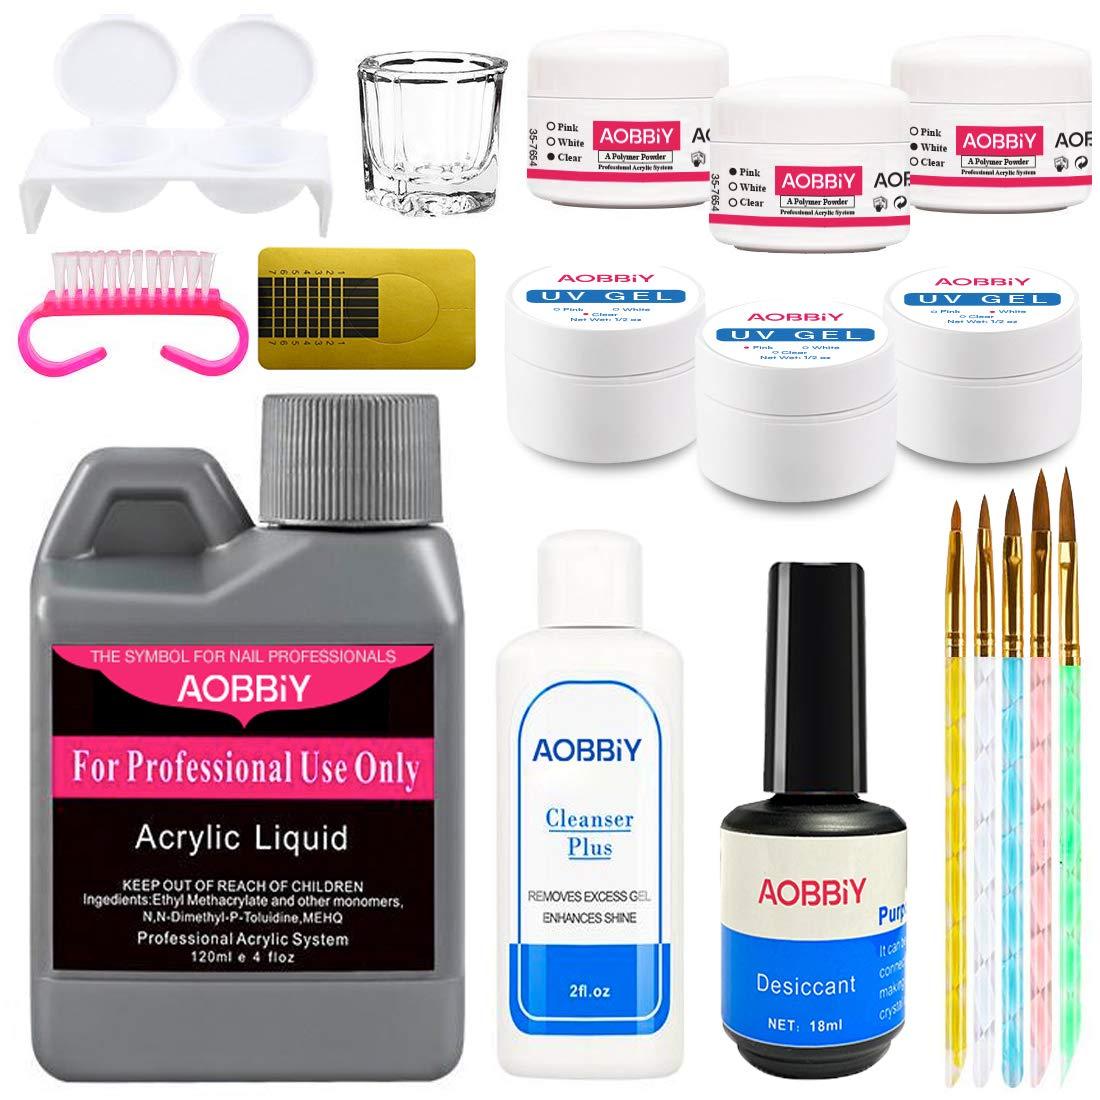 Aobbiy Acrylic Nail Art Kit, Acrylic Nail Powder Set, Professional Manicure Acrylic Nail Art Set, For Professional and Home Use.